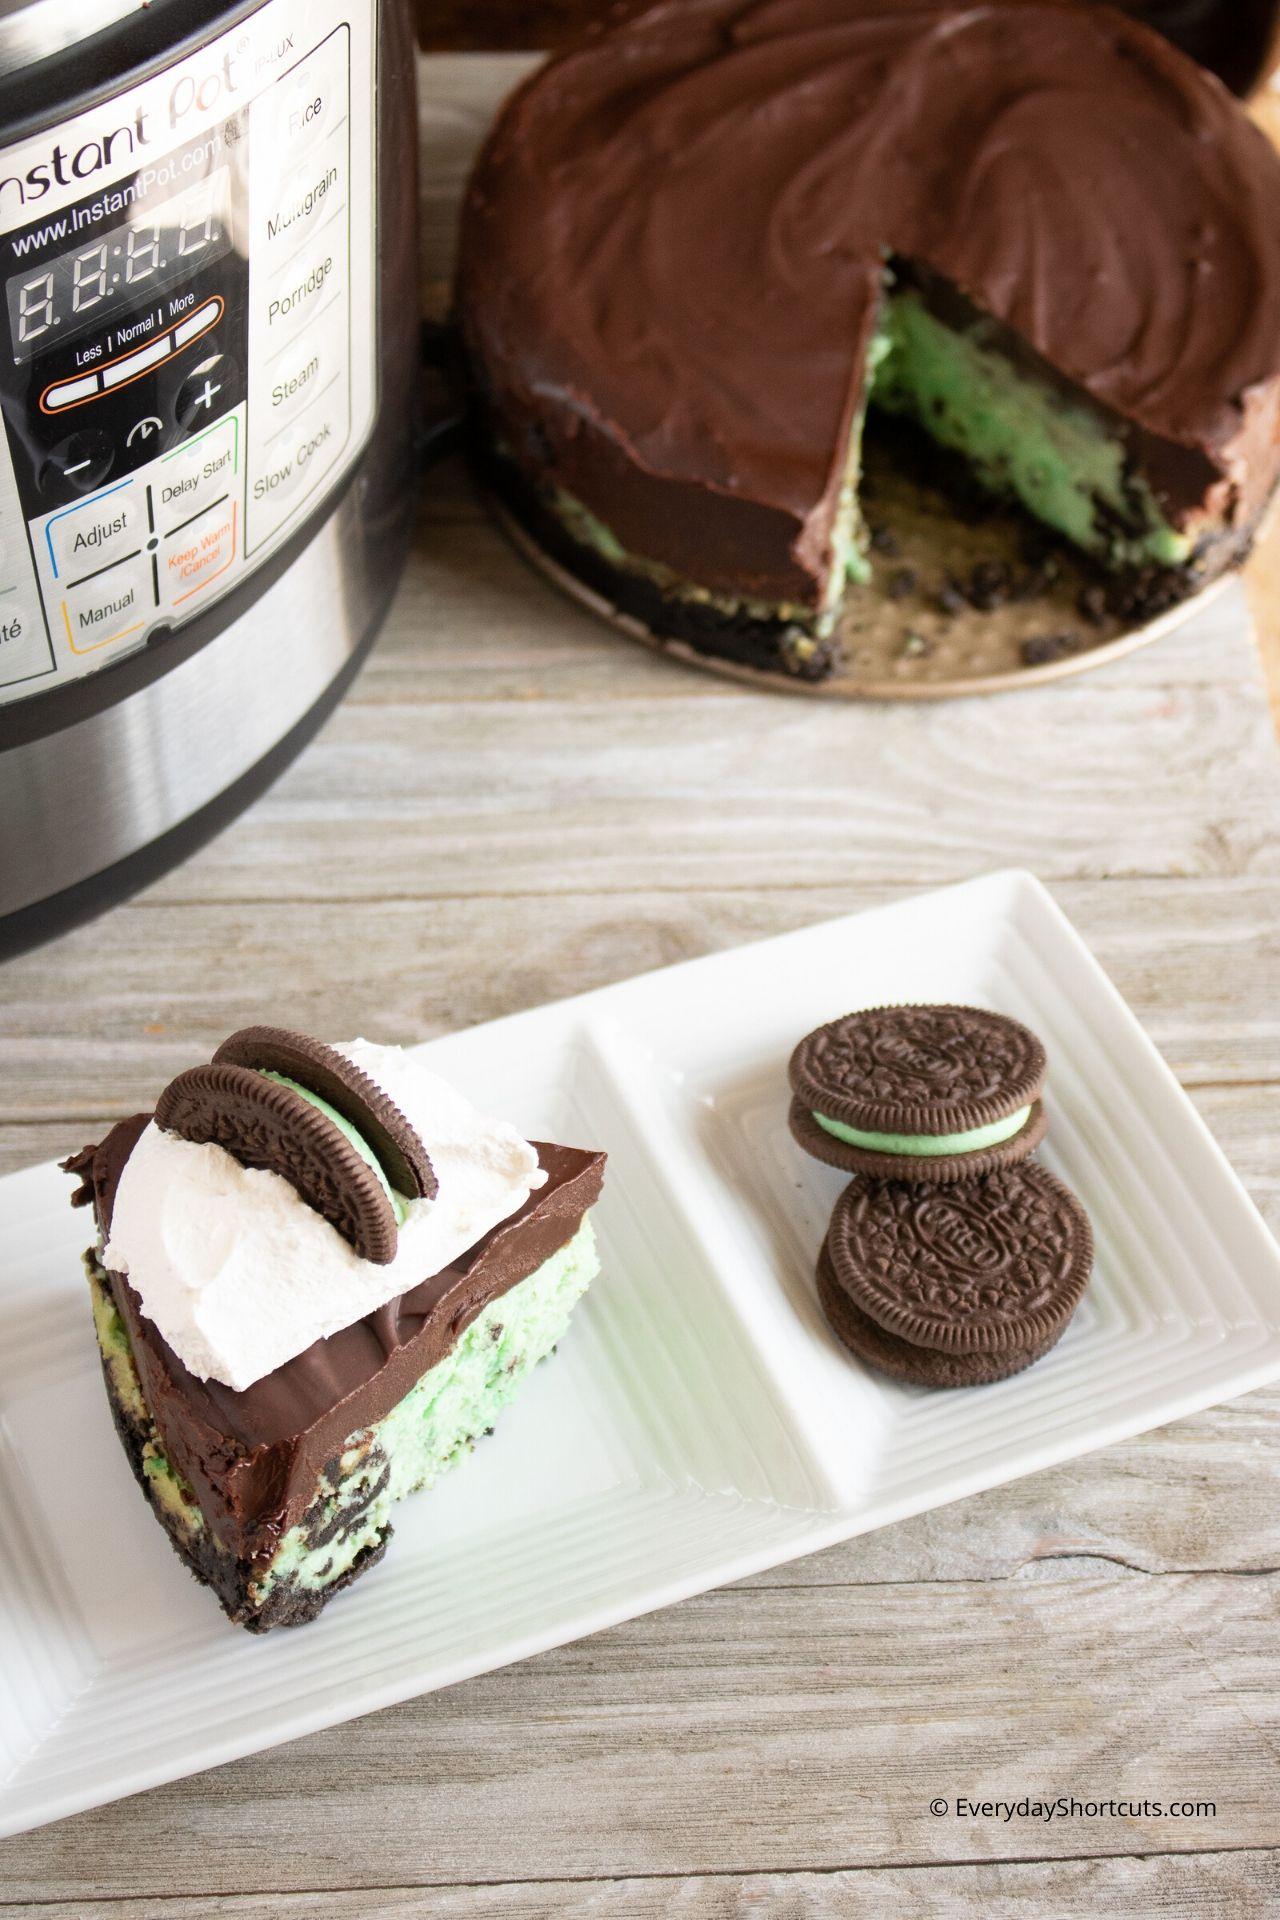 Instant Pot Mint Oreo Cheesecake with Chocolate Ganache